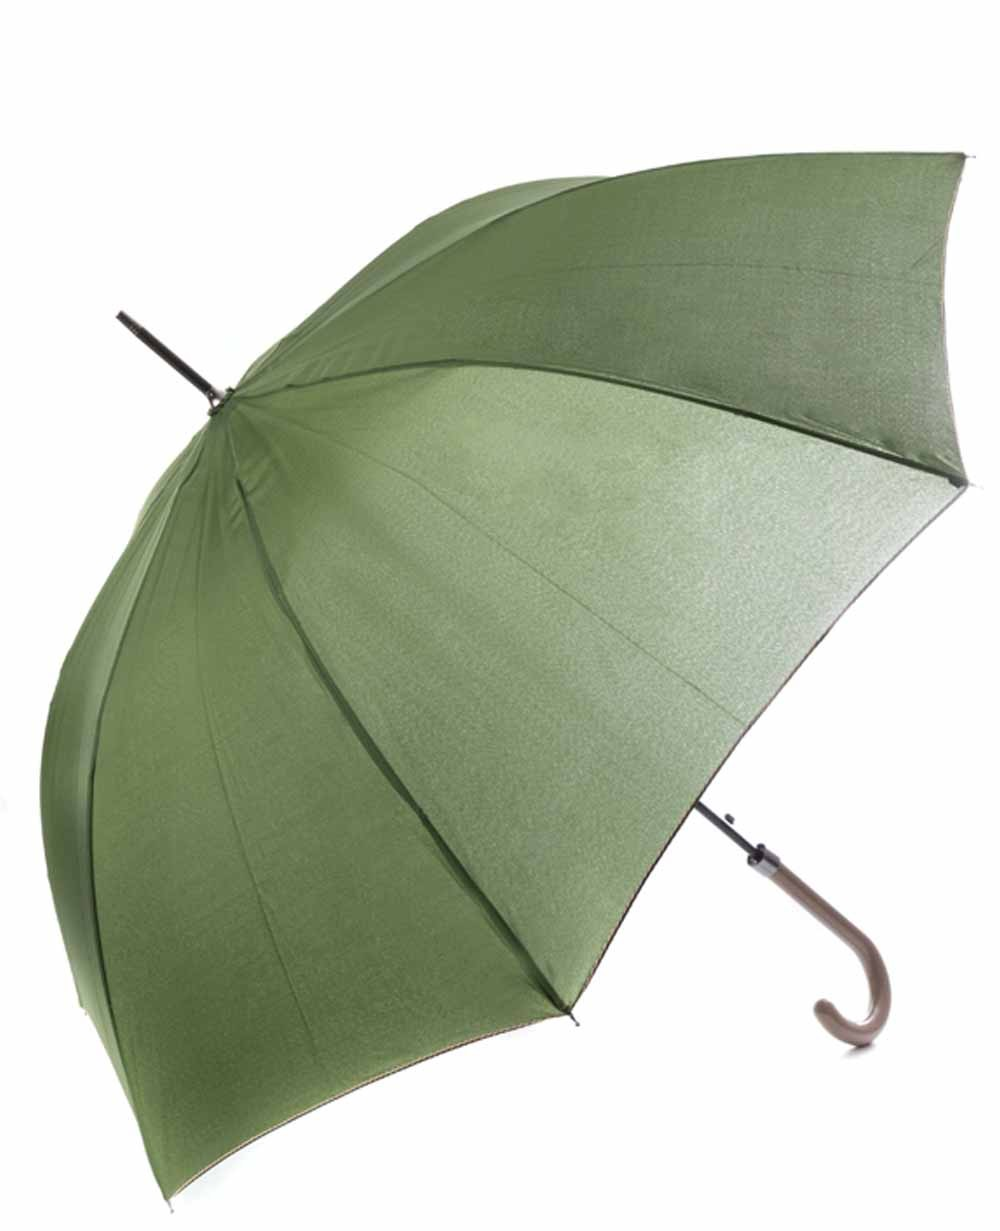 C-Collection Paraguas largo automático Verde (Foto )